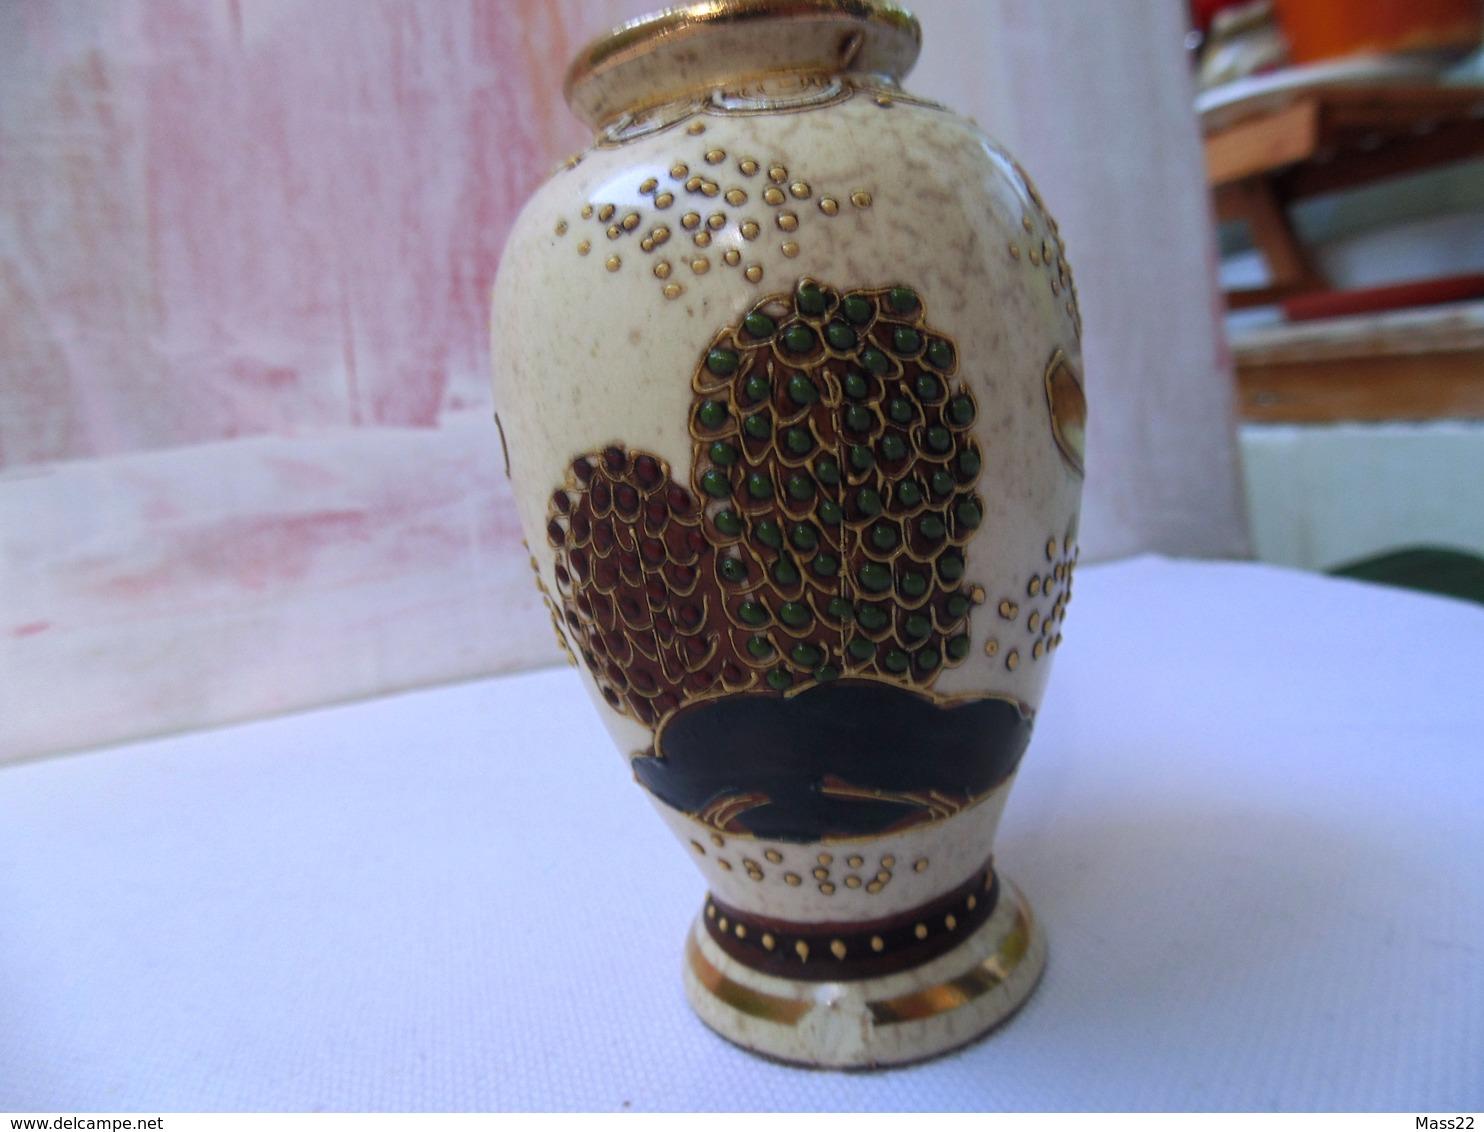 Small Satsuma Japan Vase With Decoration And Stamp In Gold - Kinkozan Tsukuru? Light Damage - Otros